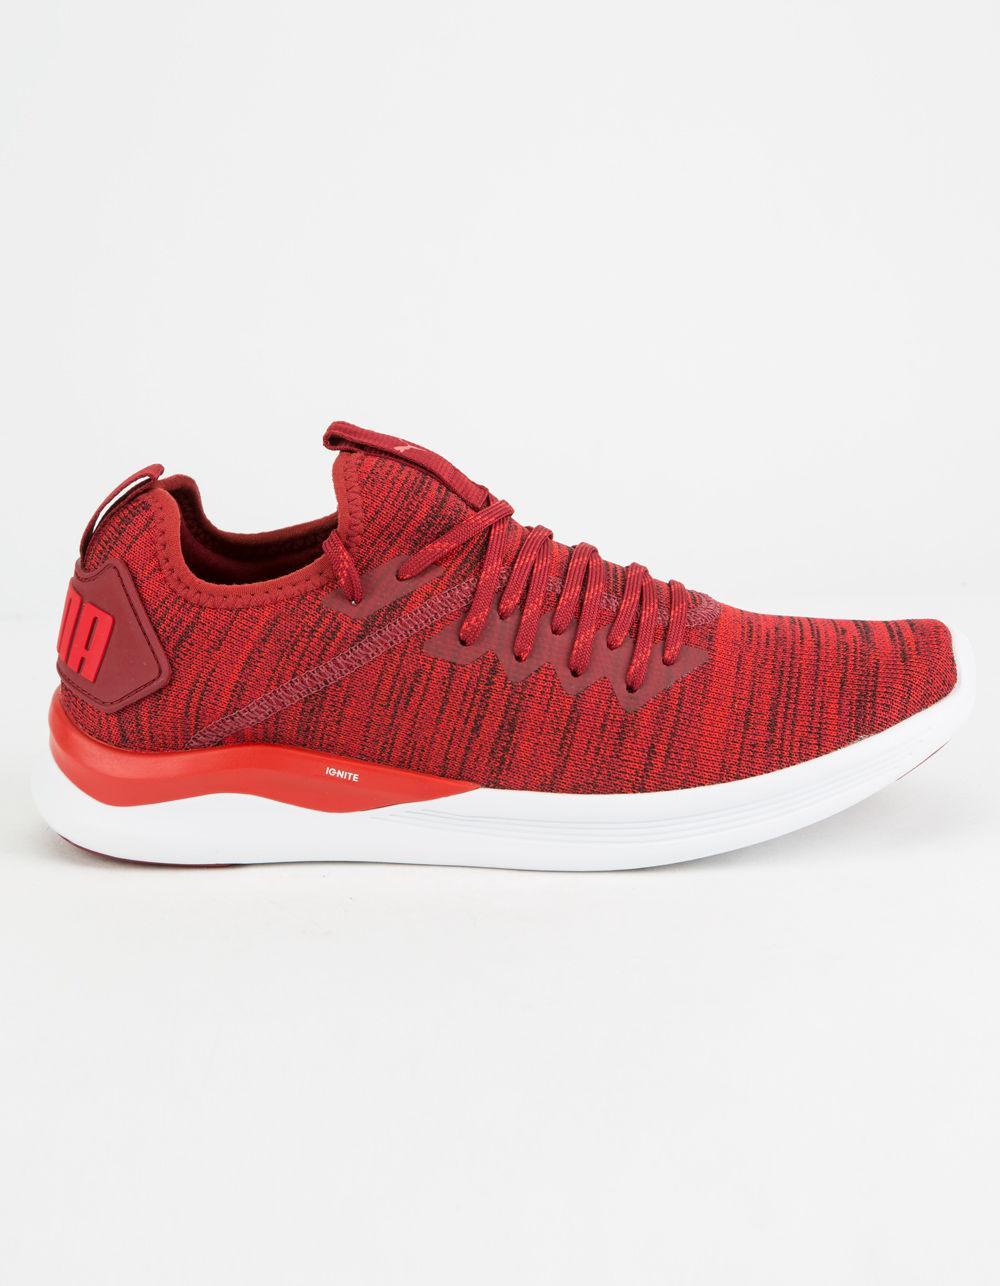 new style cf9f0 13194 Women's Ignite Flash Evoknit Red Dahlia Shoes